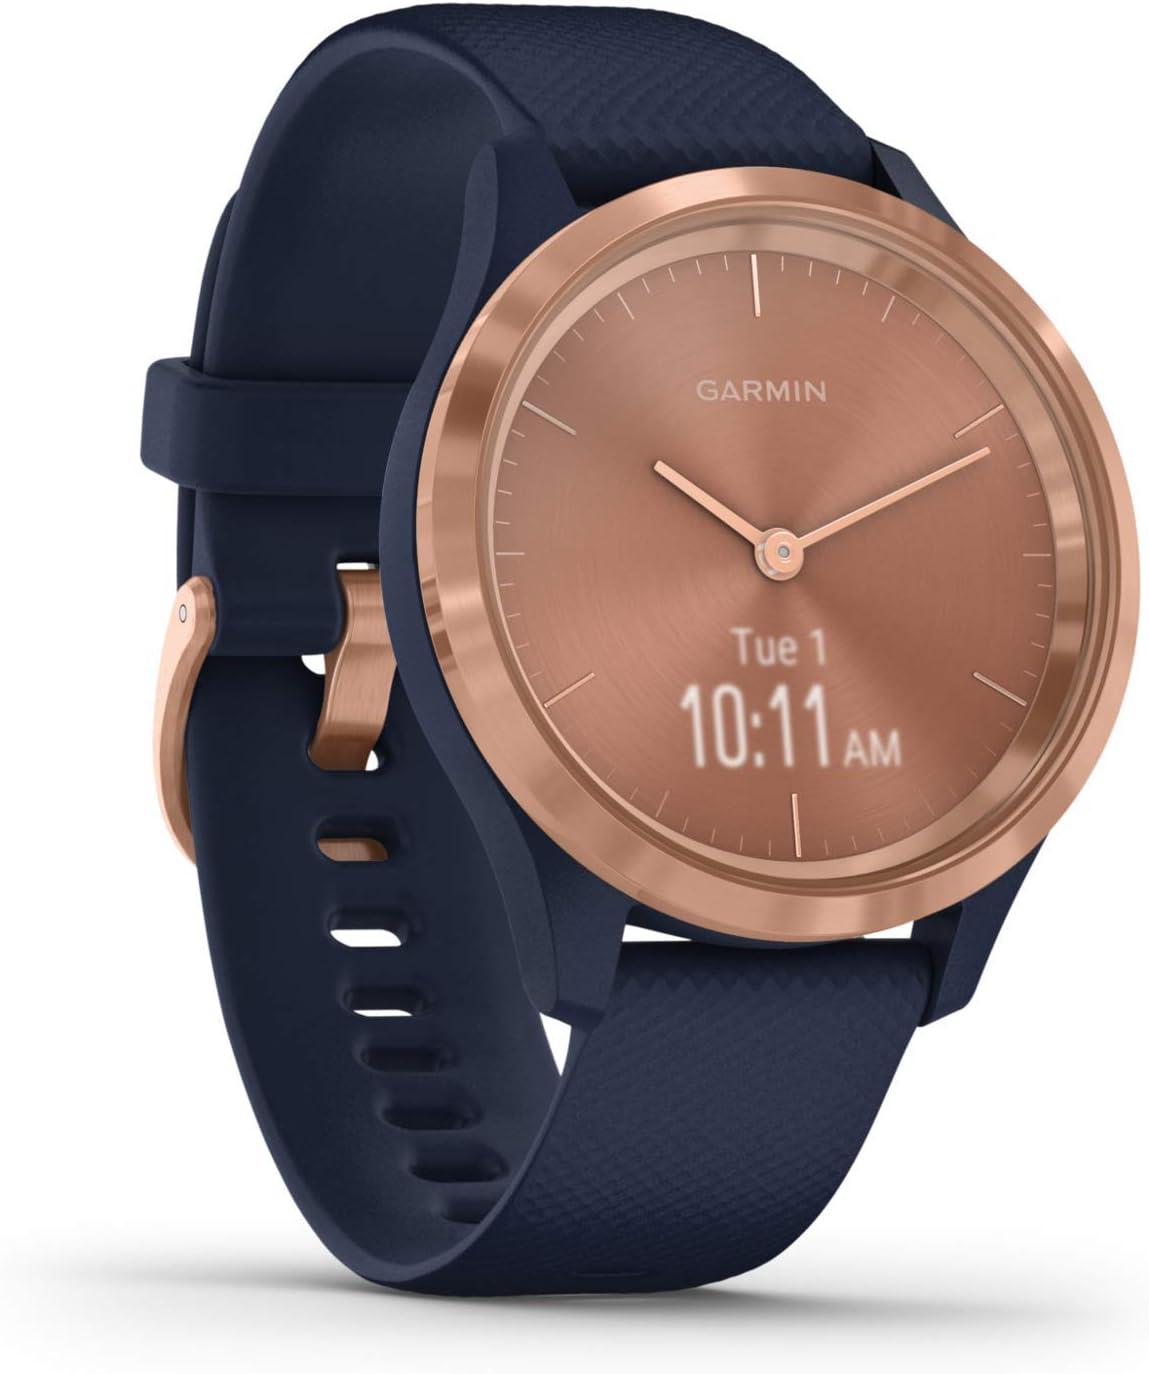 Garmin Vívomove 3S Sport Reloj Inteligente, Gold y Azul, Small